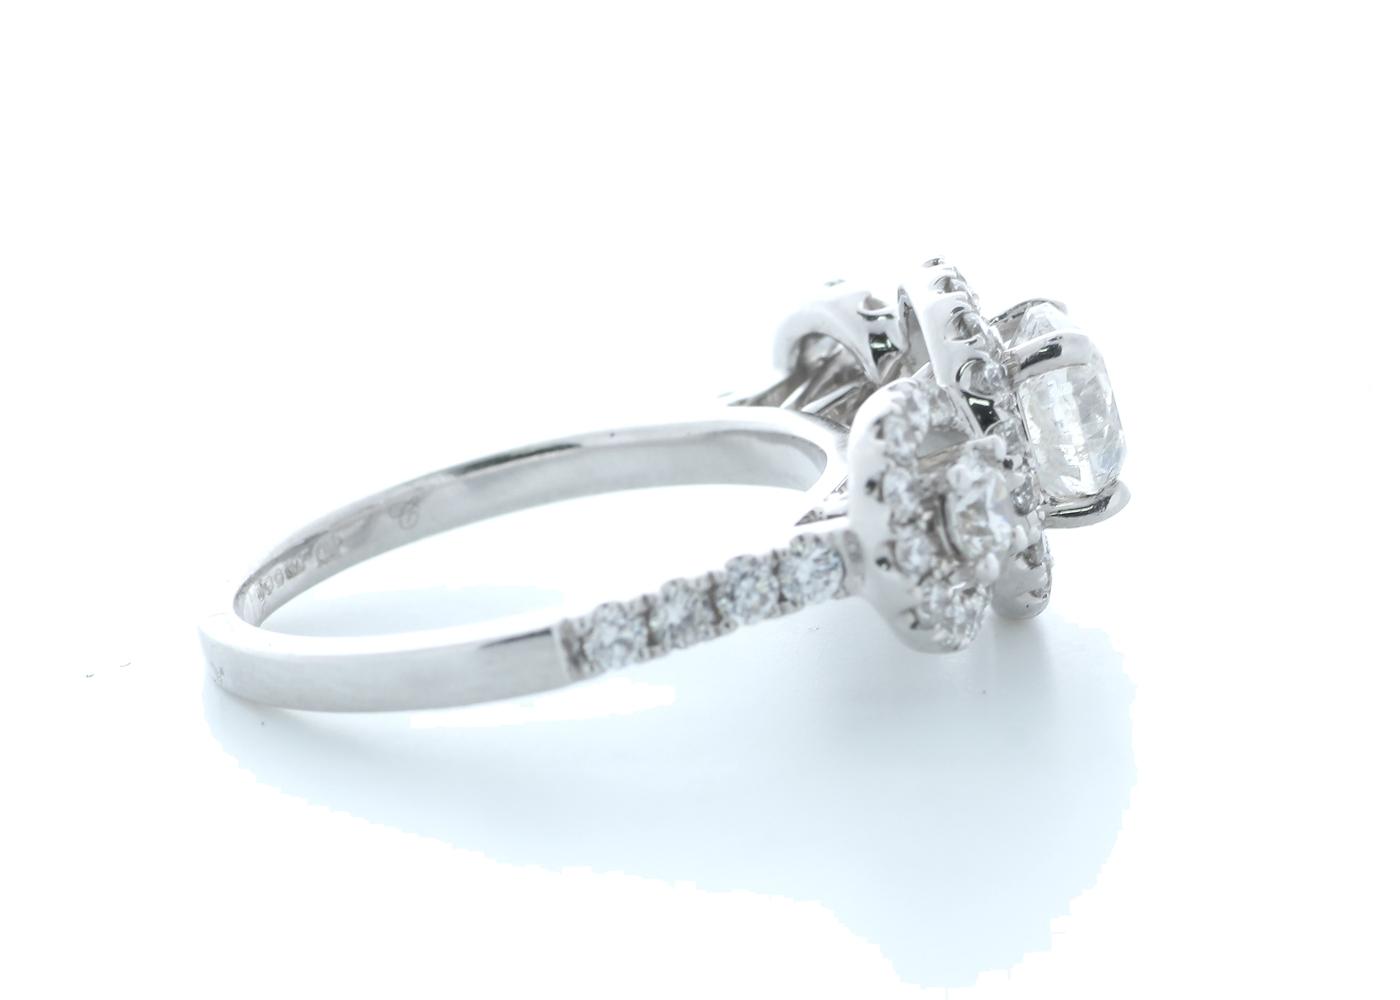 18ct White Gold Three Stone Halo Set Diamond Ring 1.91 Carats - Image 4 of 5